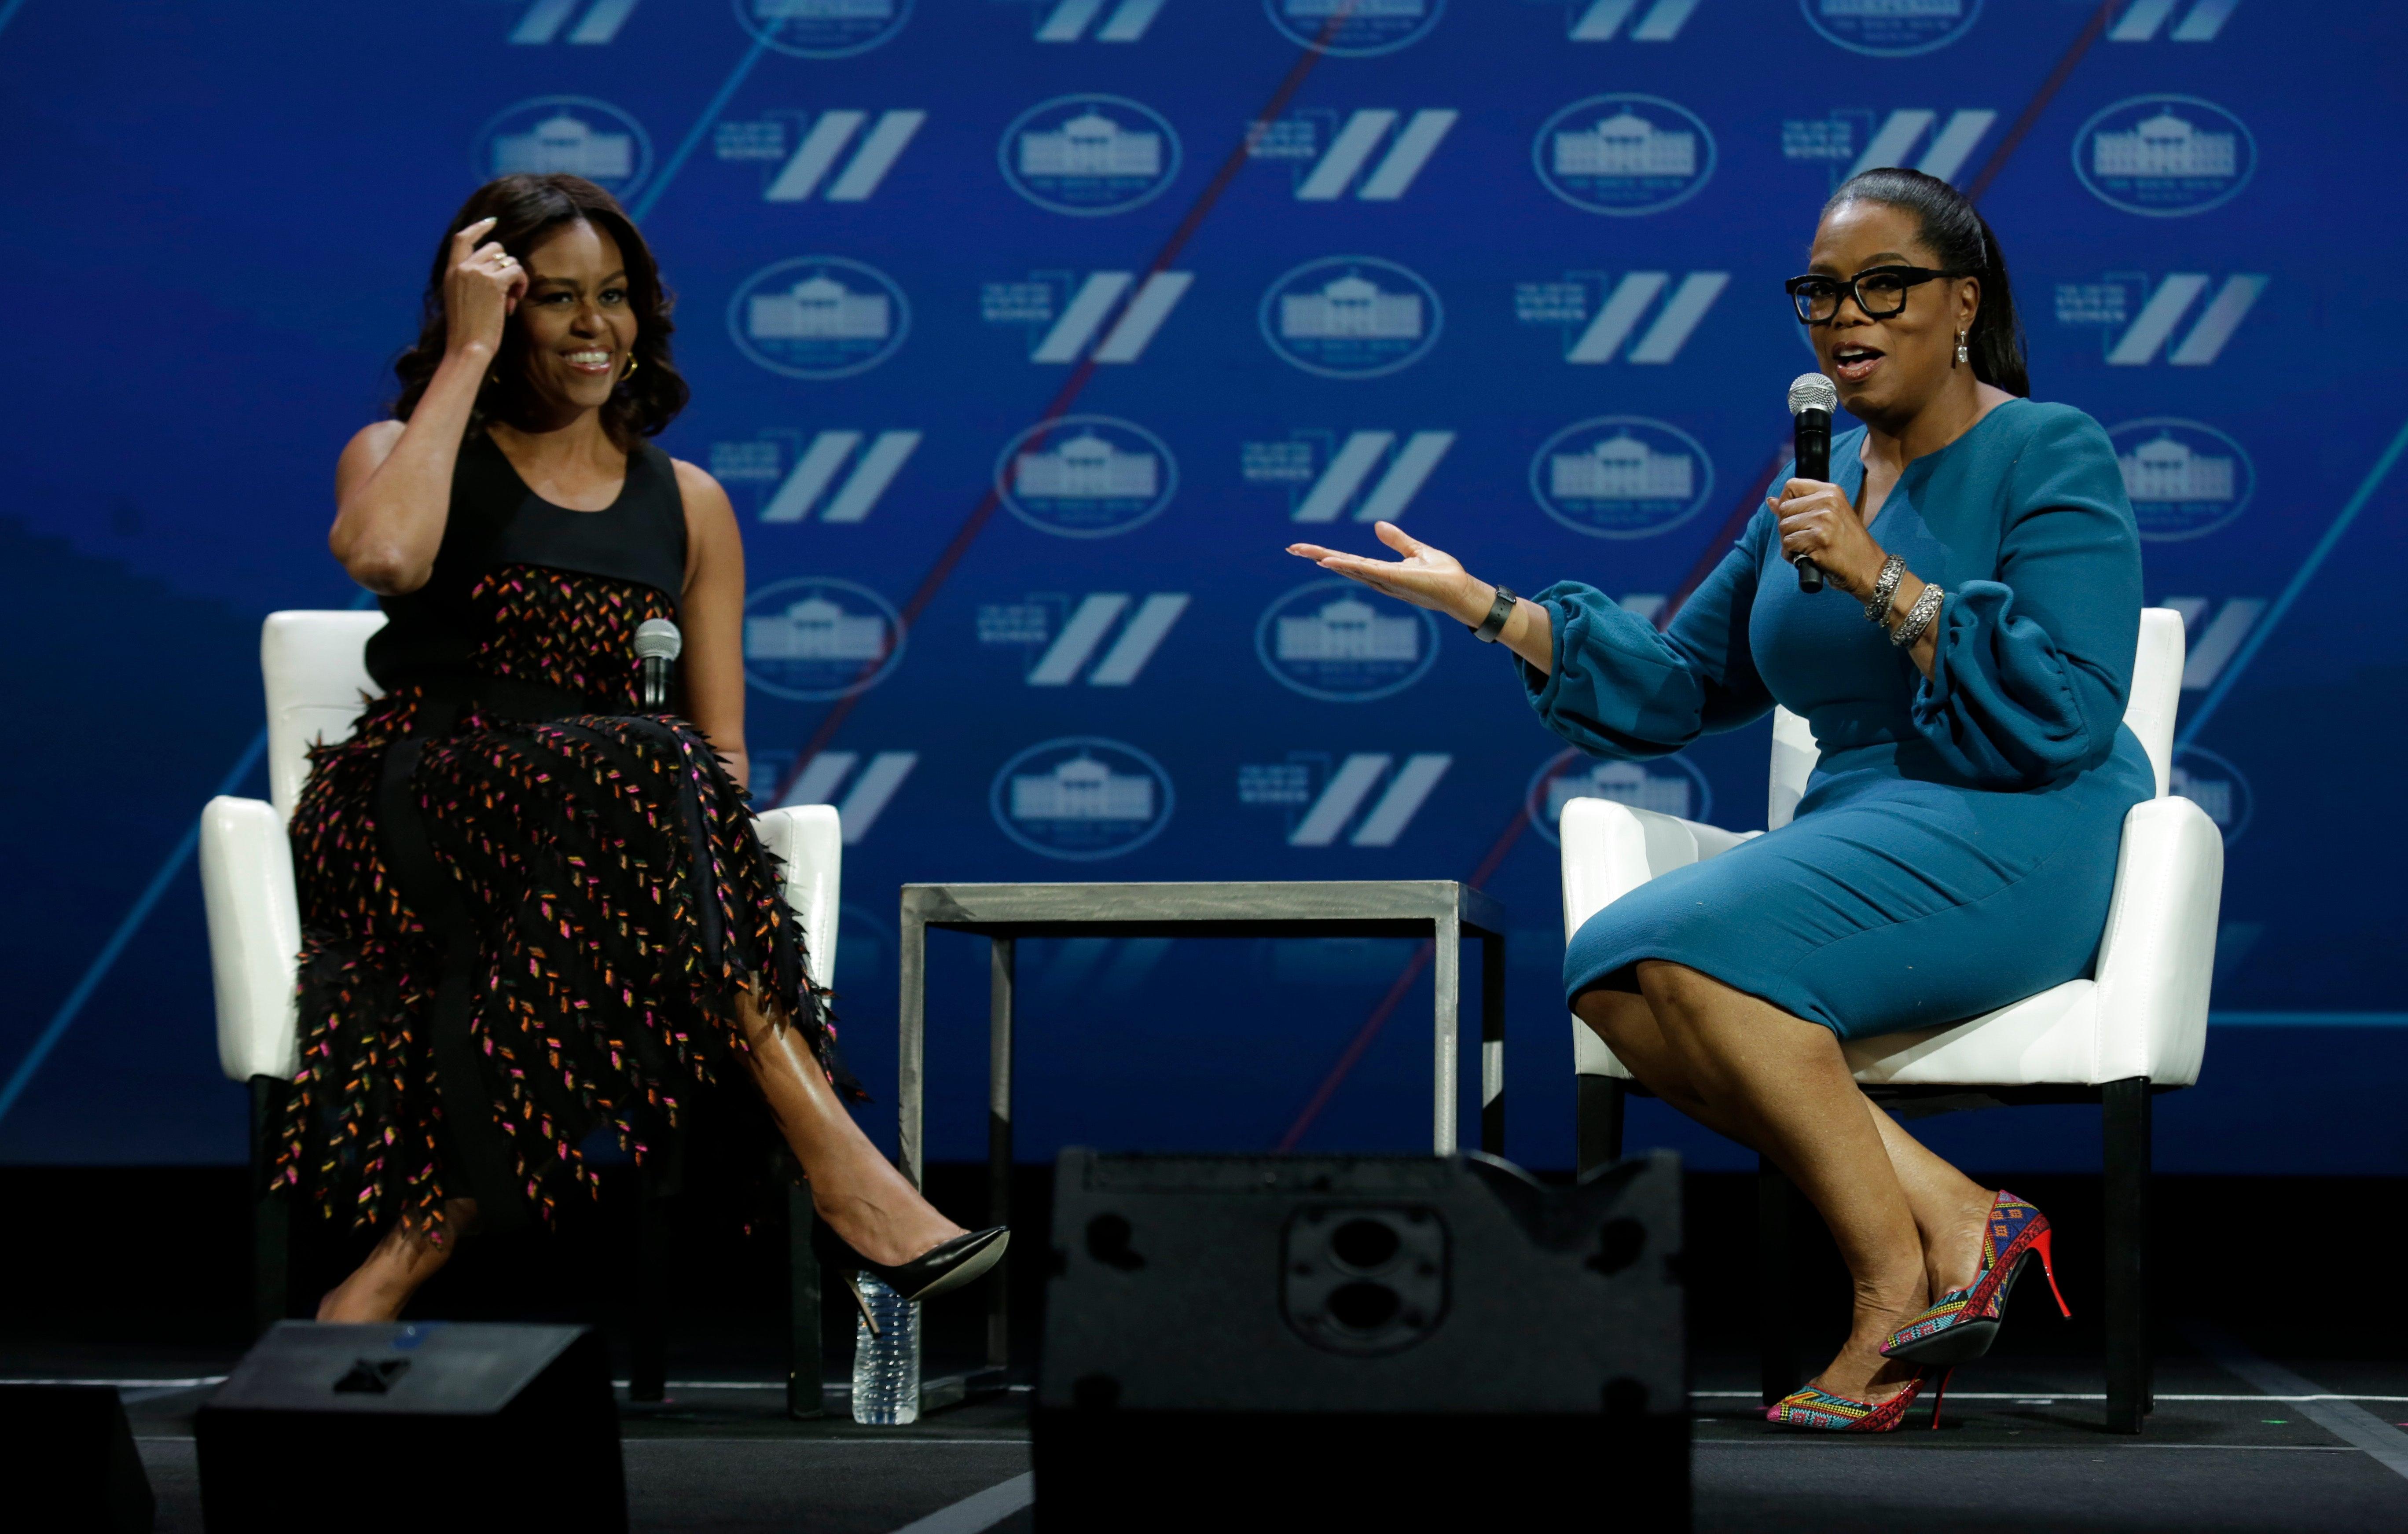 WhatMichelle Obama's FarewellInterview With Oprah Meant ToBlack Women Like Me